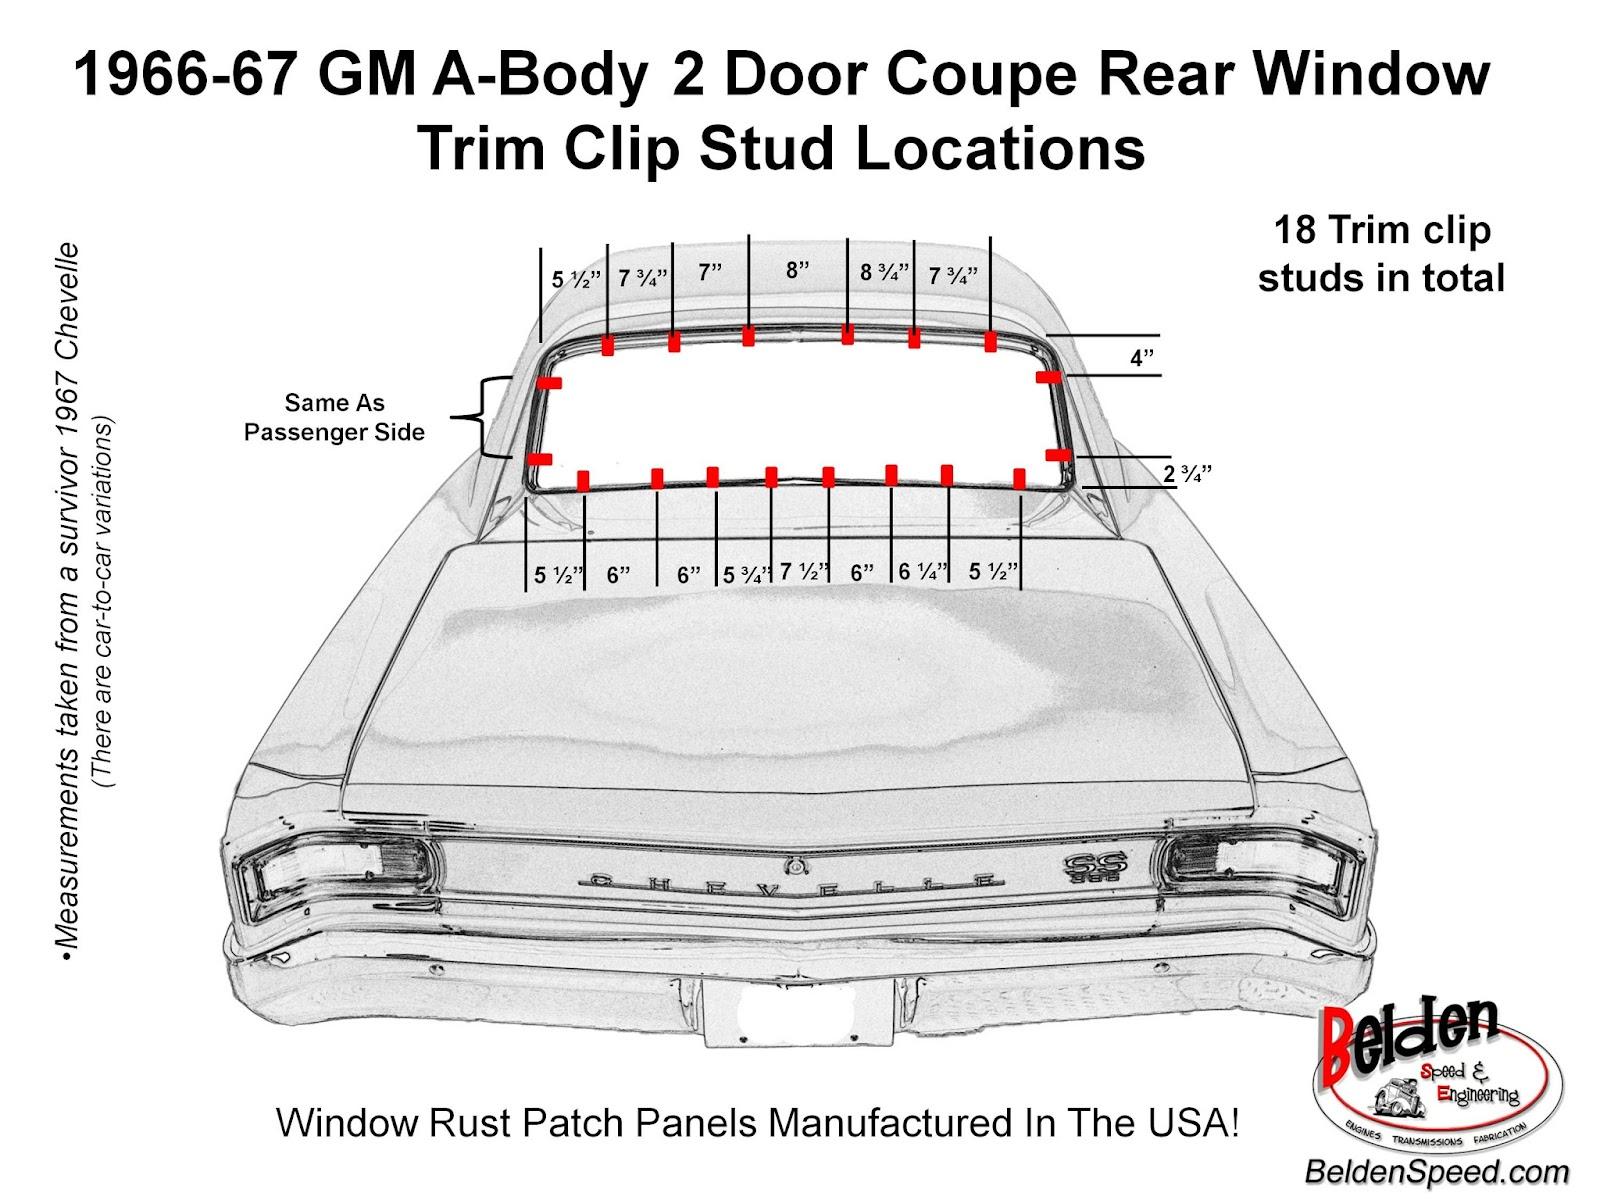 1967 Chevelle Diagram Ss Wiring 1966 Rear Window Trim Clip Stud Location Rh Beldenspeed Com Pdf Fuse Box